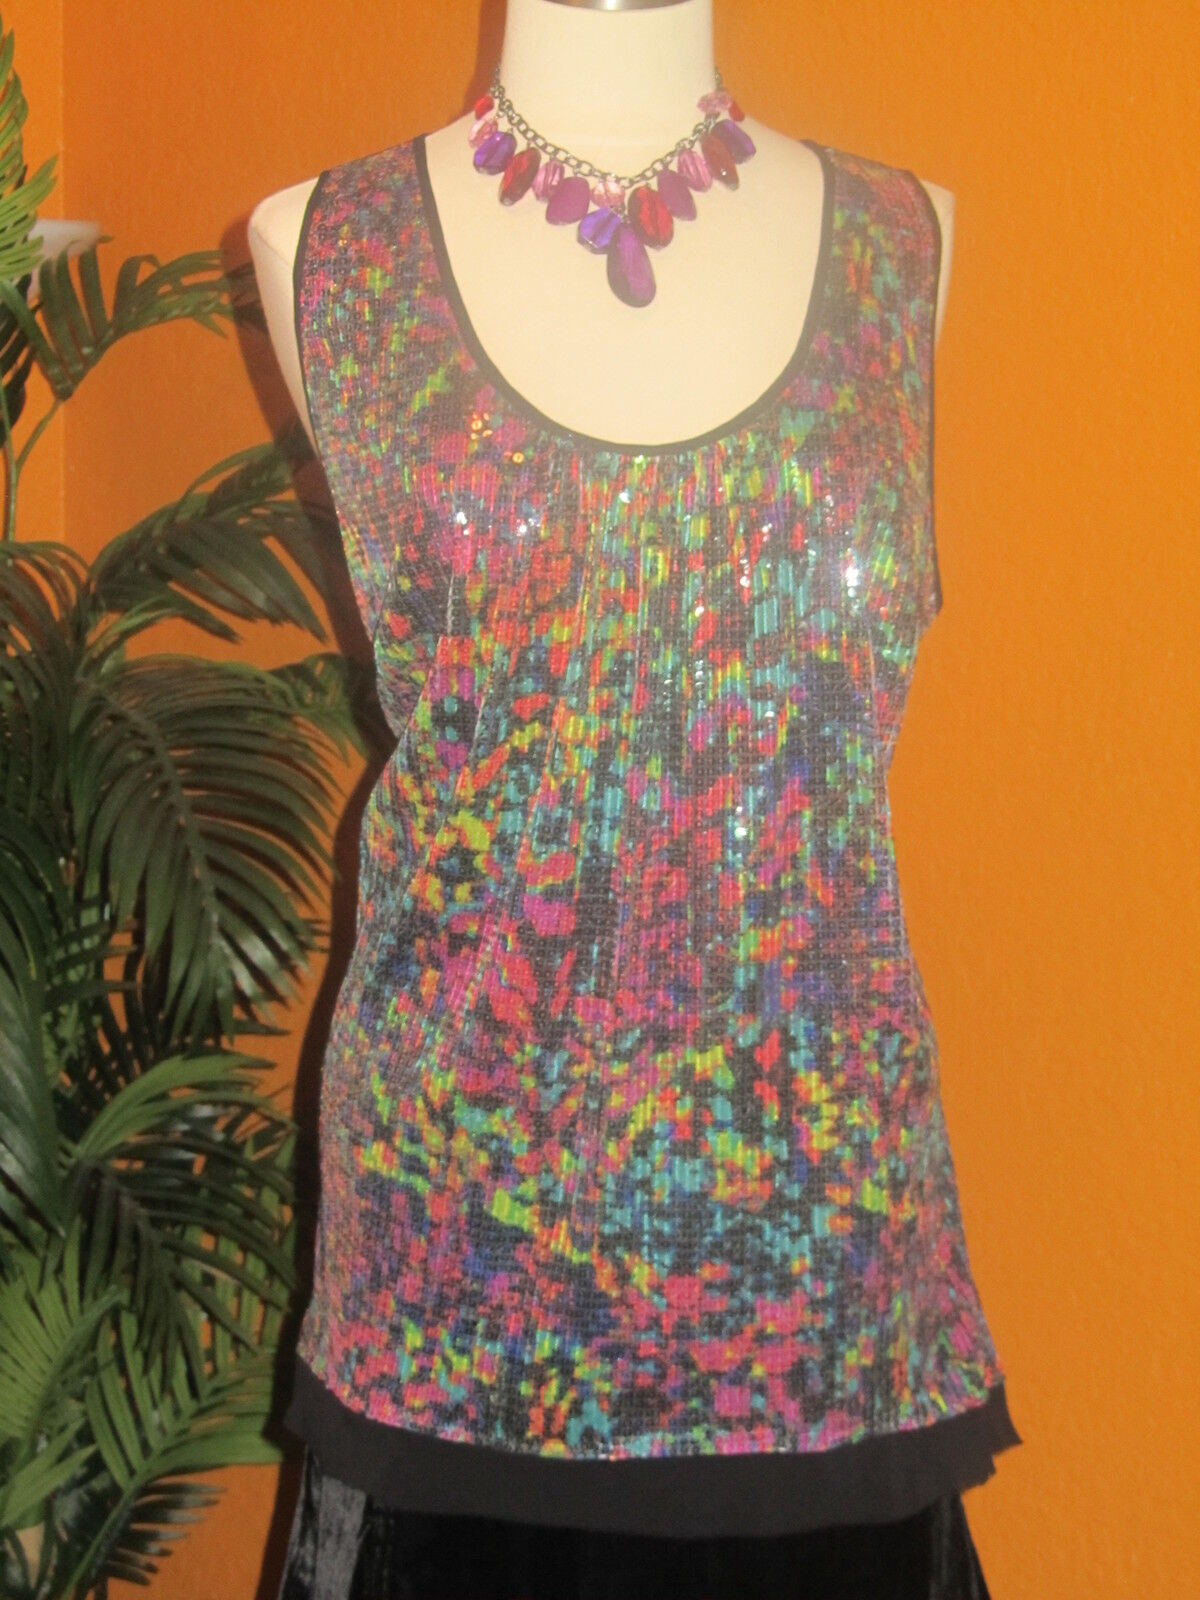 LANE BRYANT NWT   damen disco party shirt 2X schwarz multi Farbes sequin 24